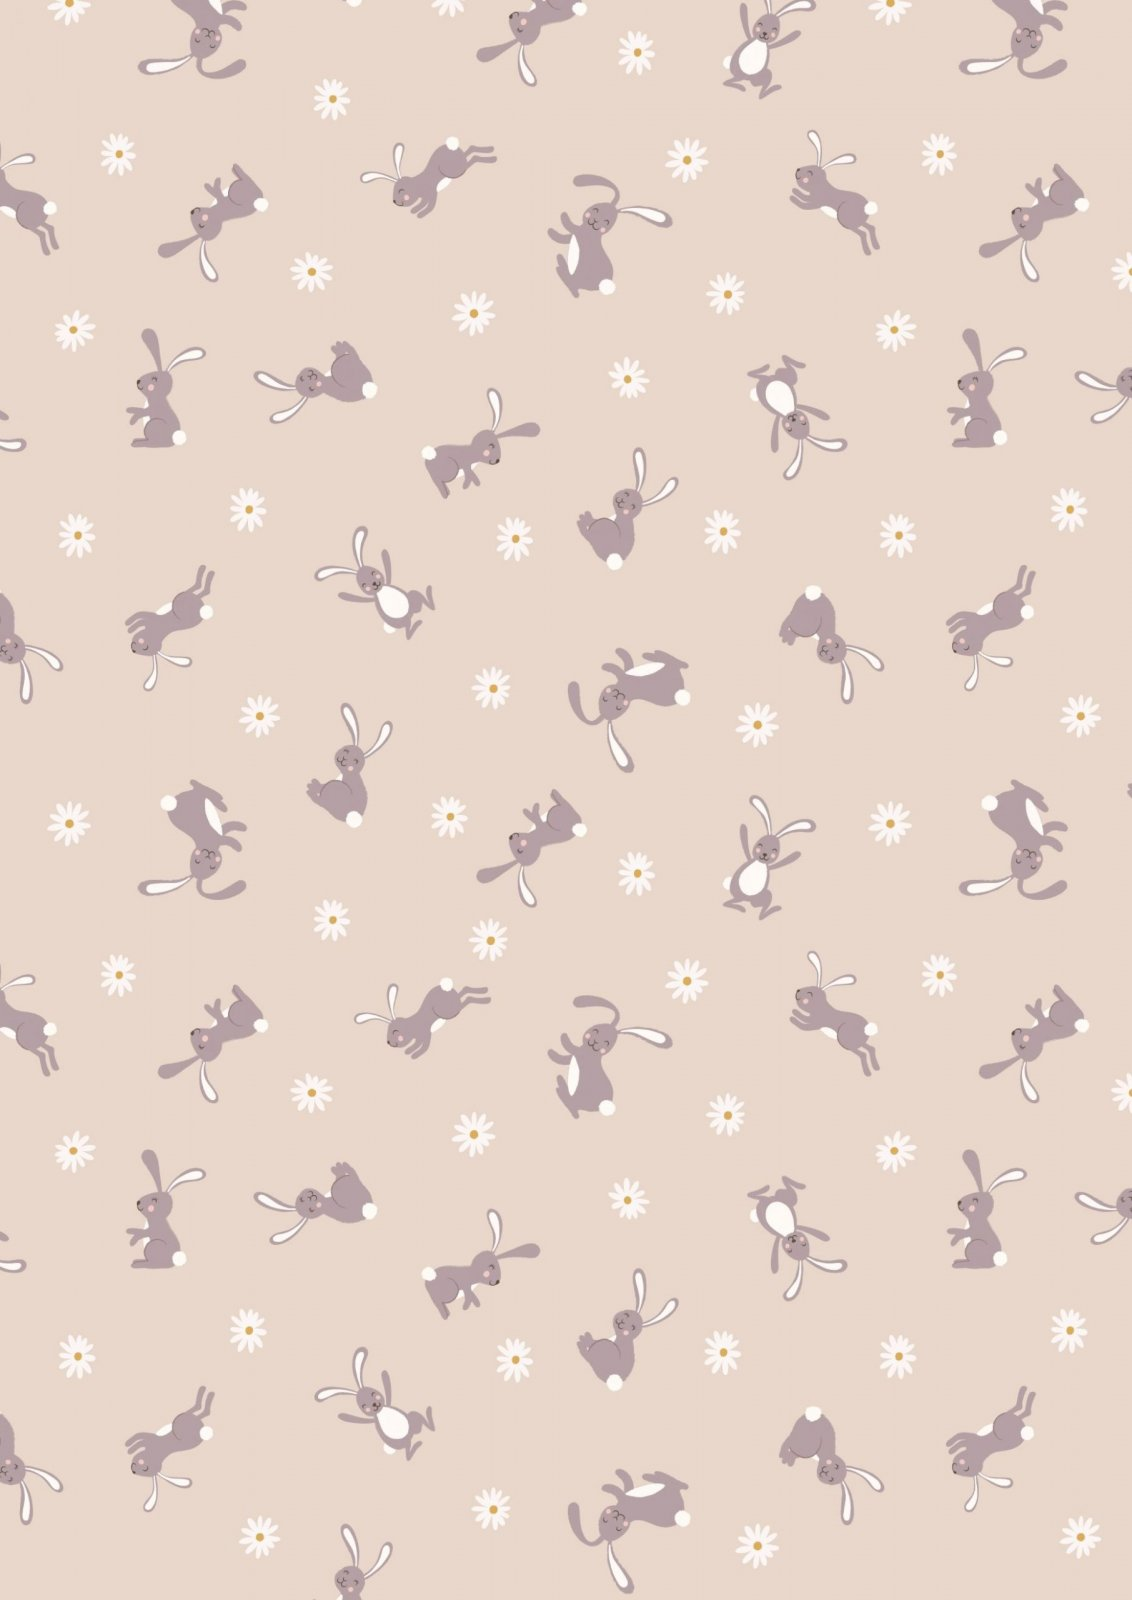 Bunny Hop A529.1